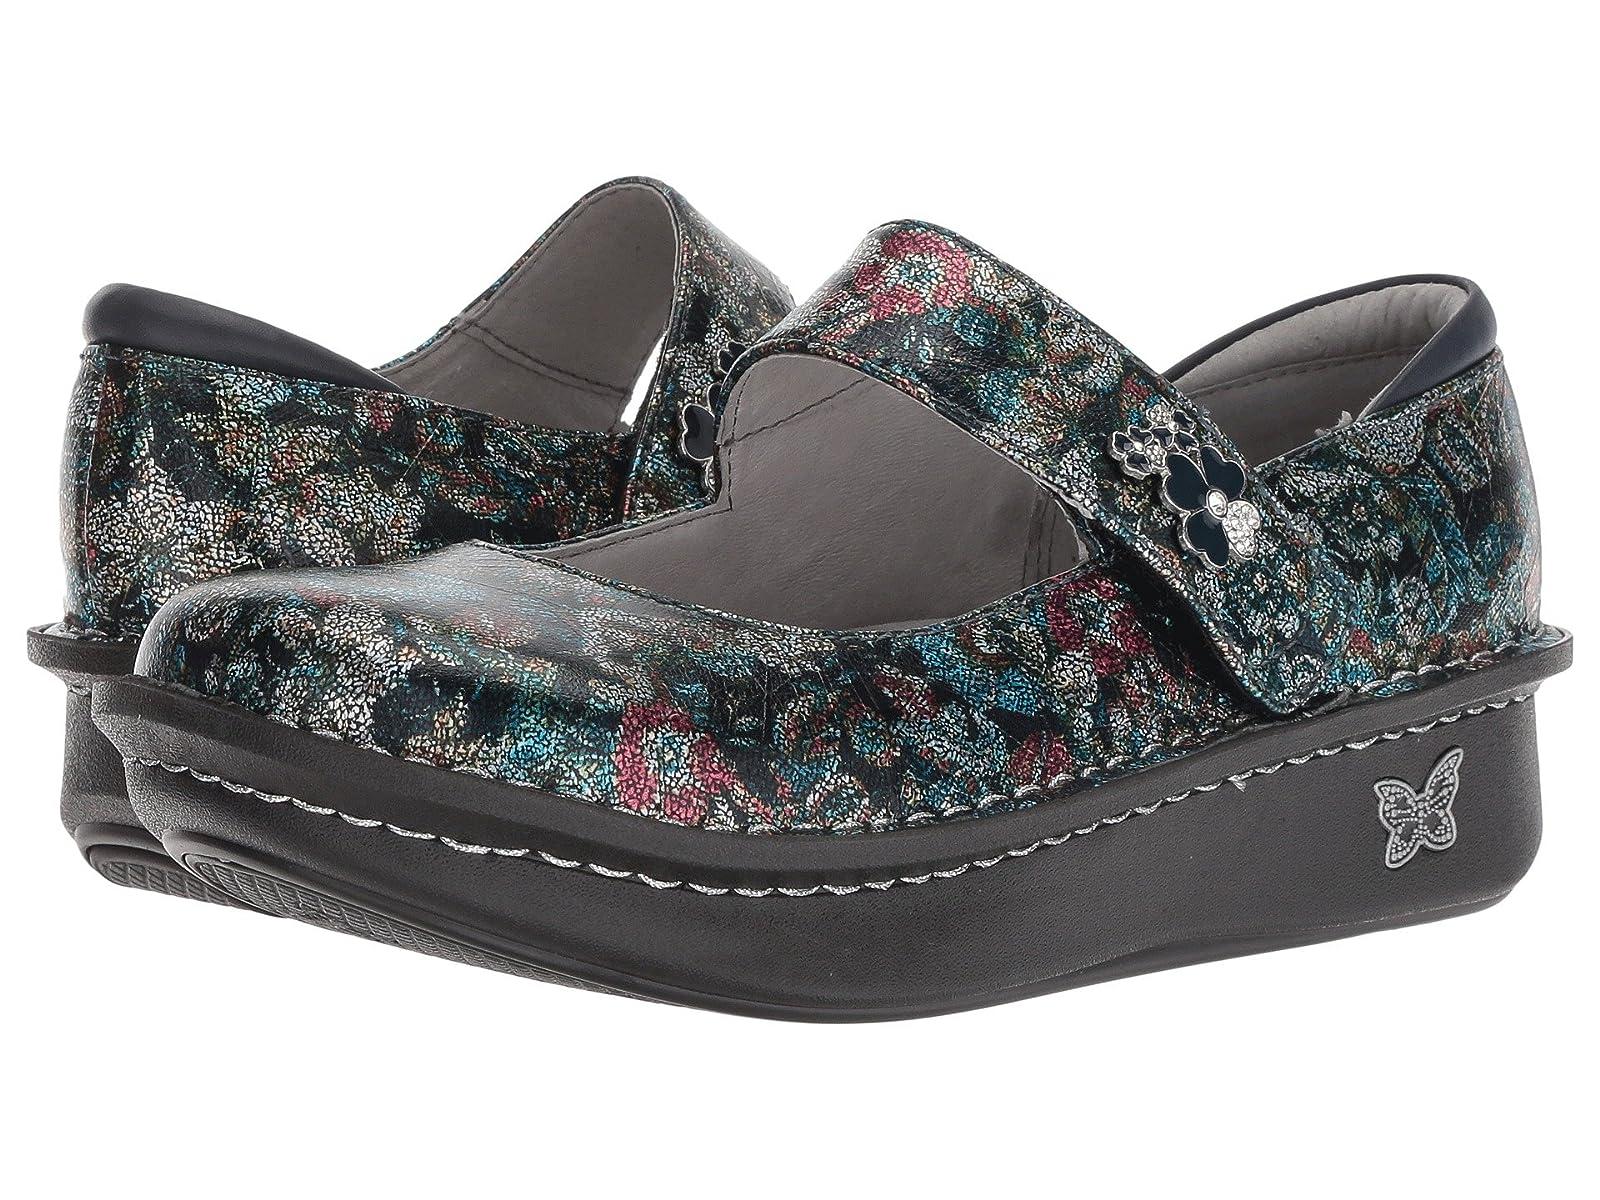 Alegria PalomaEconomical and quality shoes